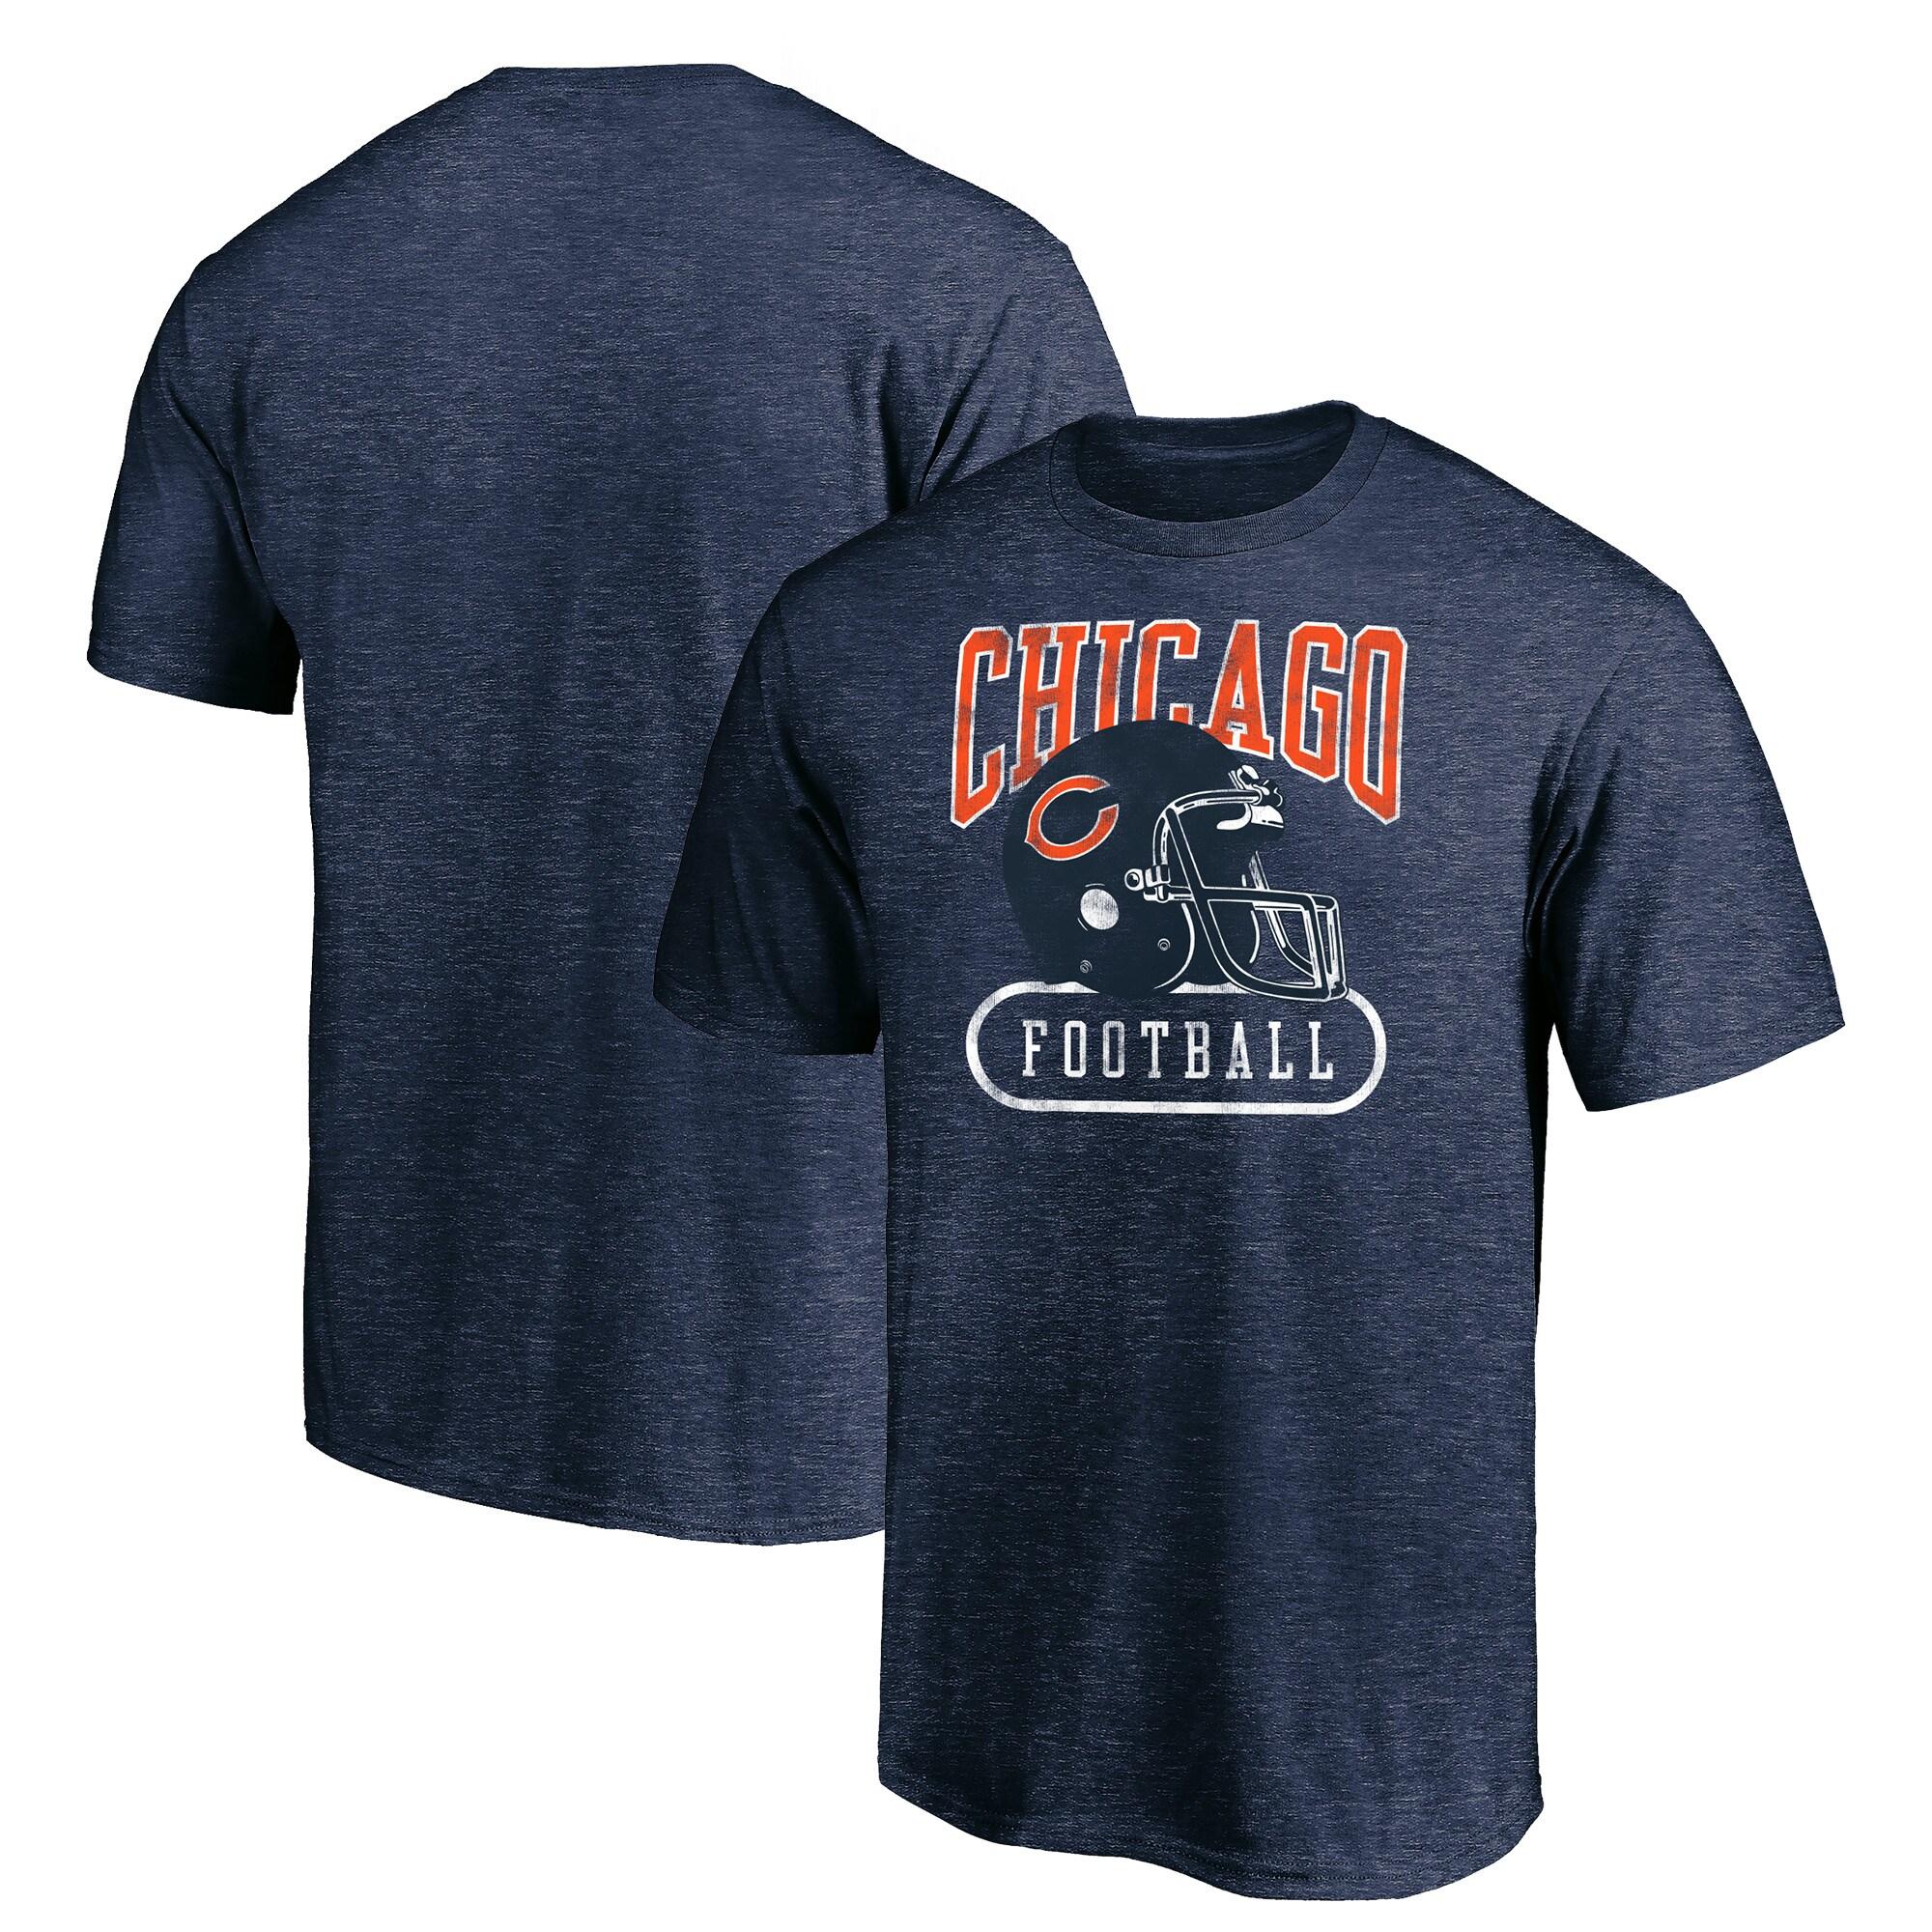 Chicago Bears Majestic True Classics Pro Club Throwback T-Shirt - Navy